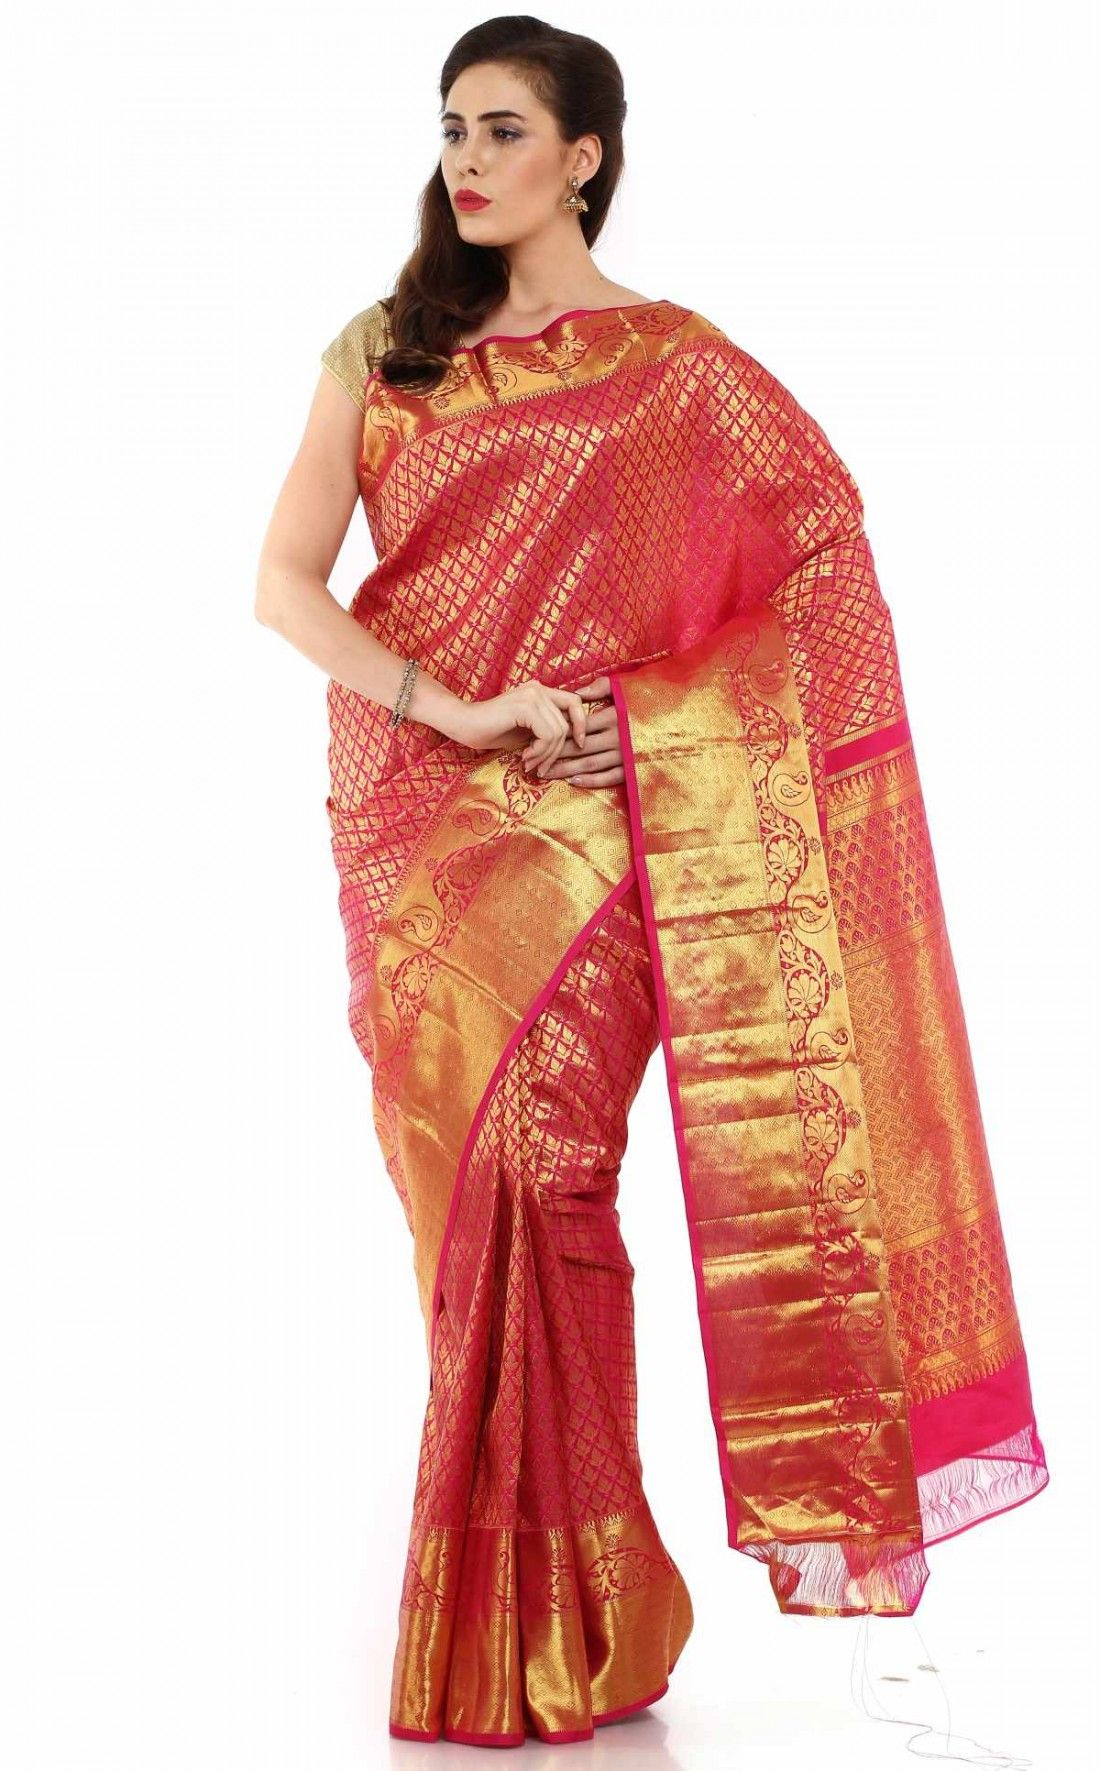 12fabc9d2c KANJEEVARAM SILK DESIGNER SAREE-Beige-SAS19-VT-Silk - Kanchipuram Sarees -  Sarees - WOMENS